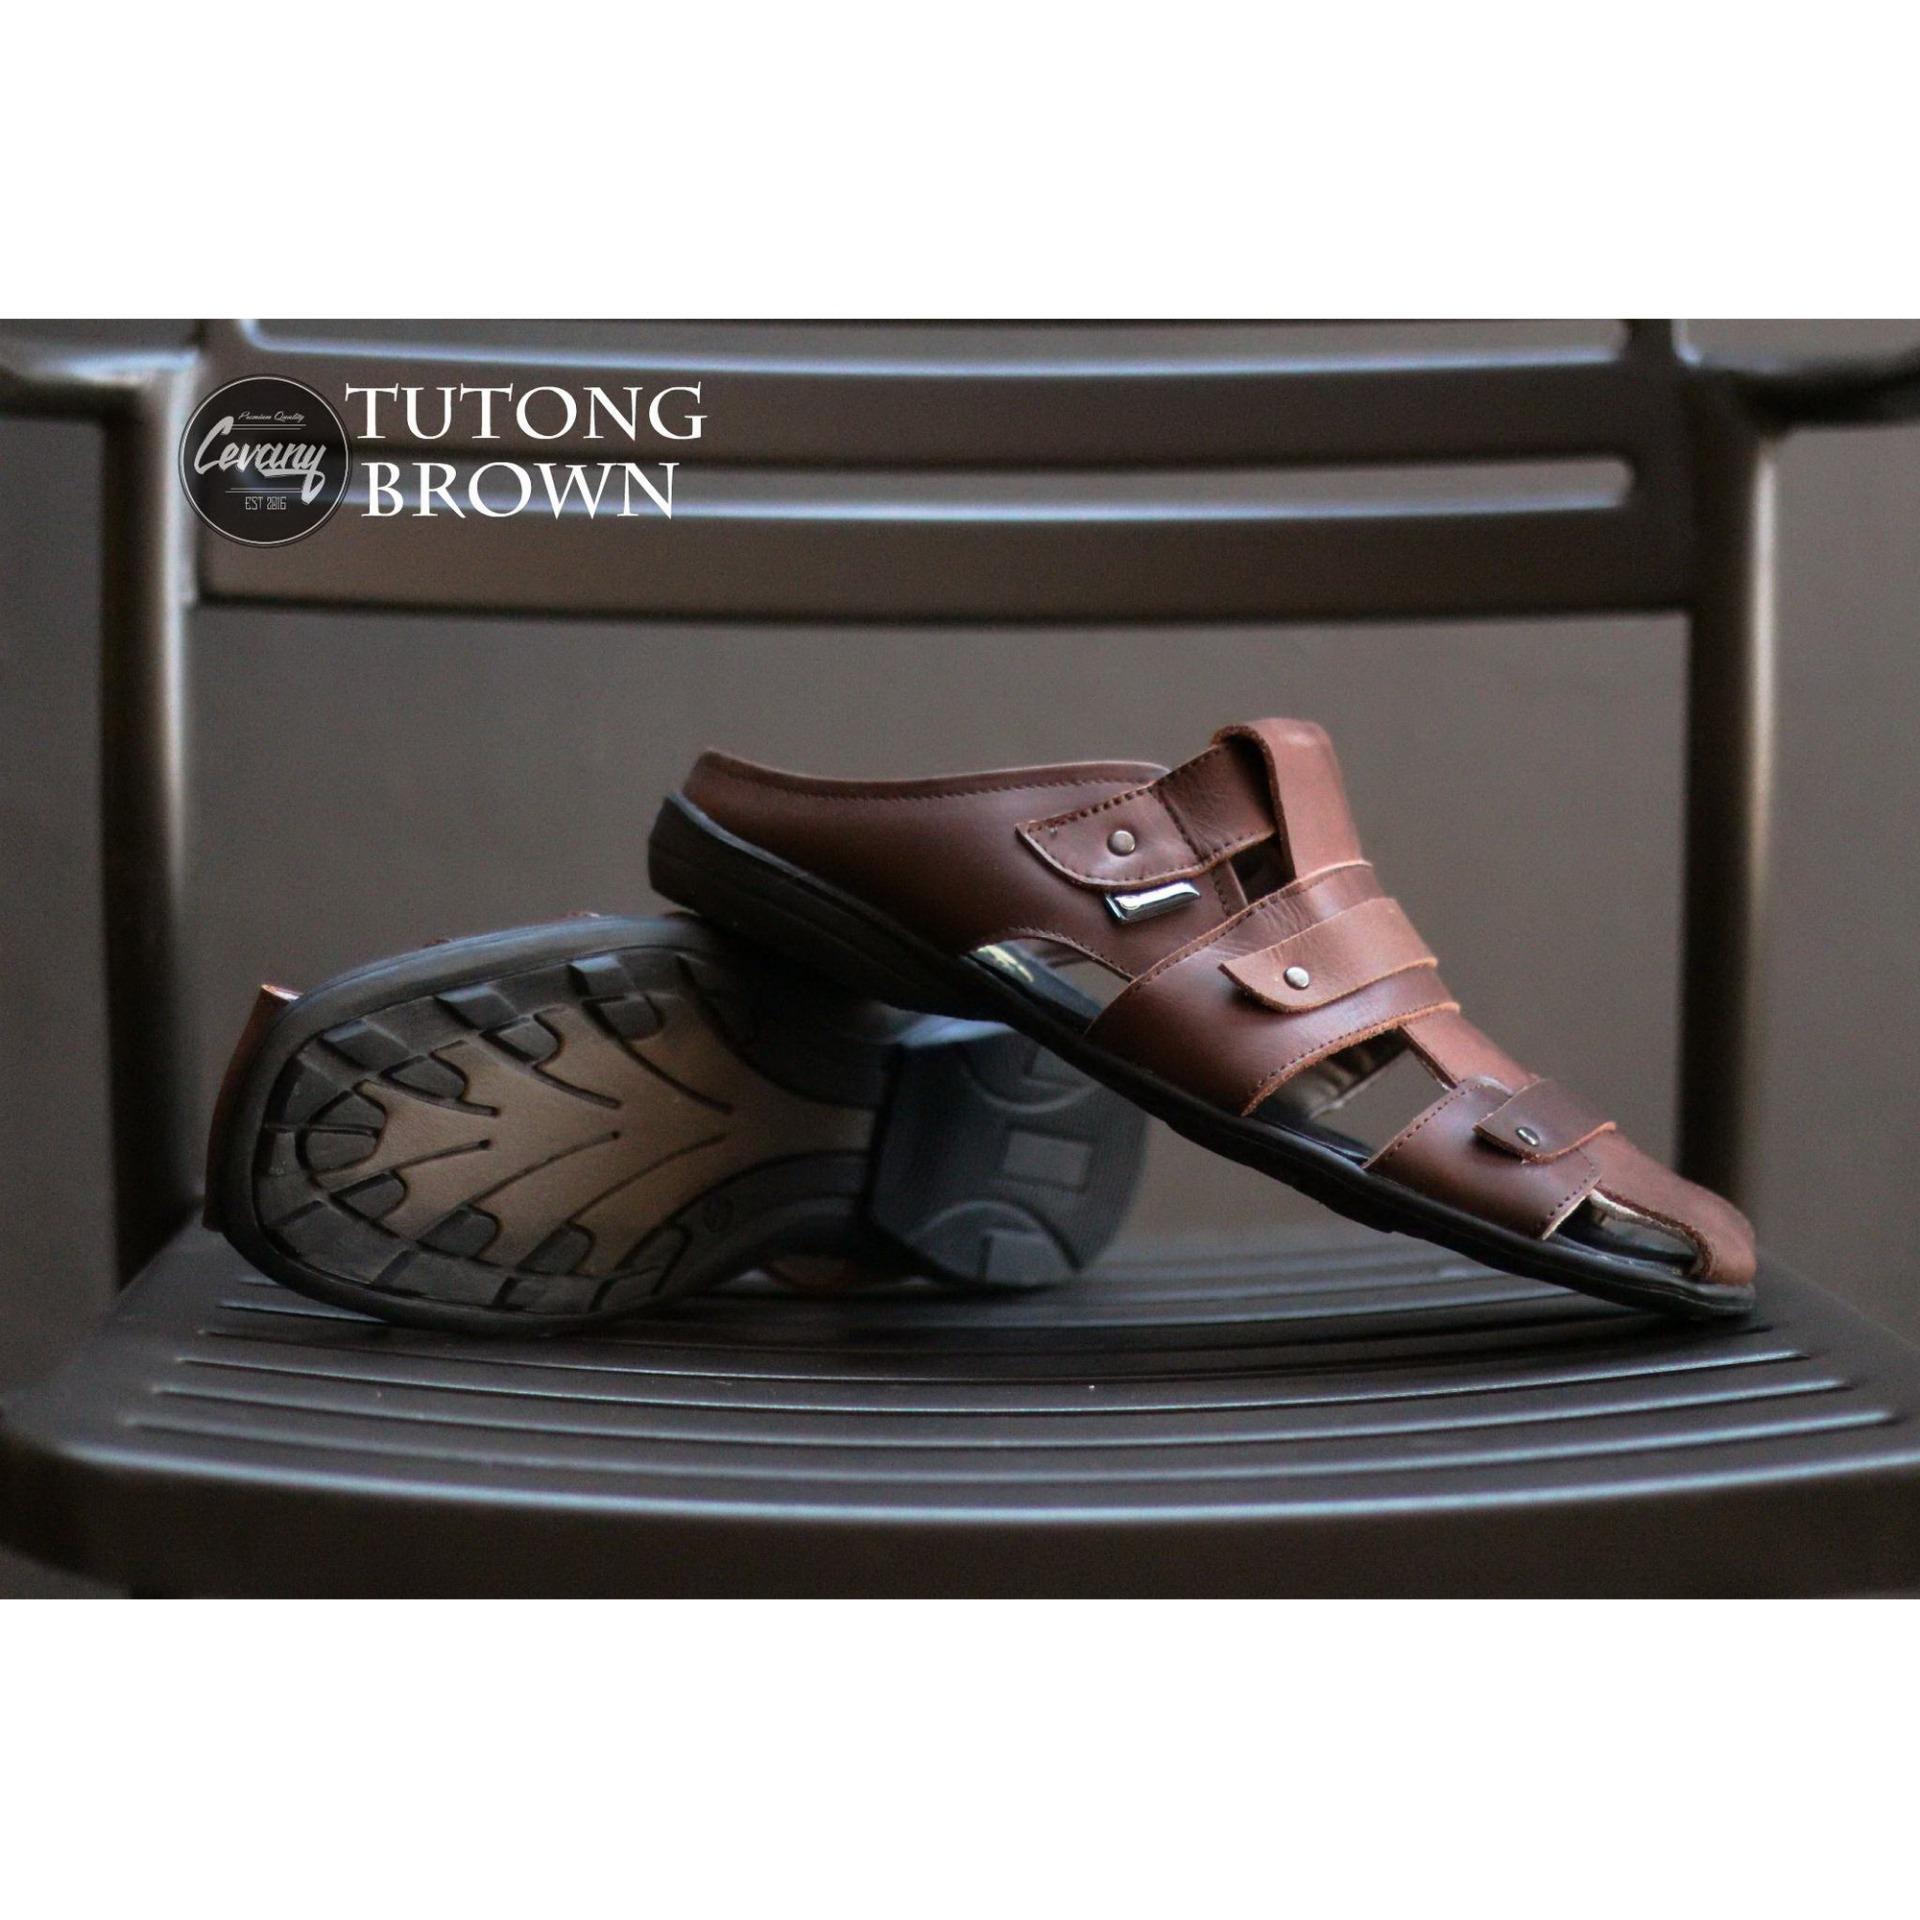 Kelebihan Sepatu Sandal Cevany Bustong Borongsong Kulit Sintetis Pantopel Veil Detail Gambar Premium Pantofel Pria Slop Terbaru